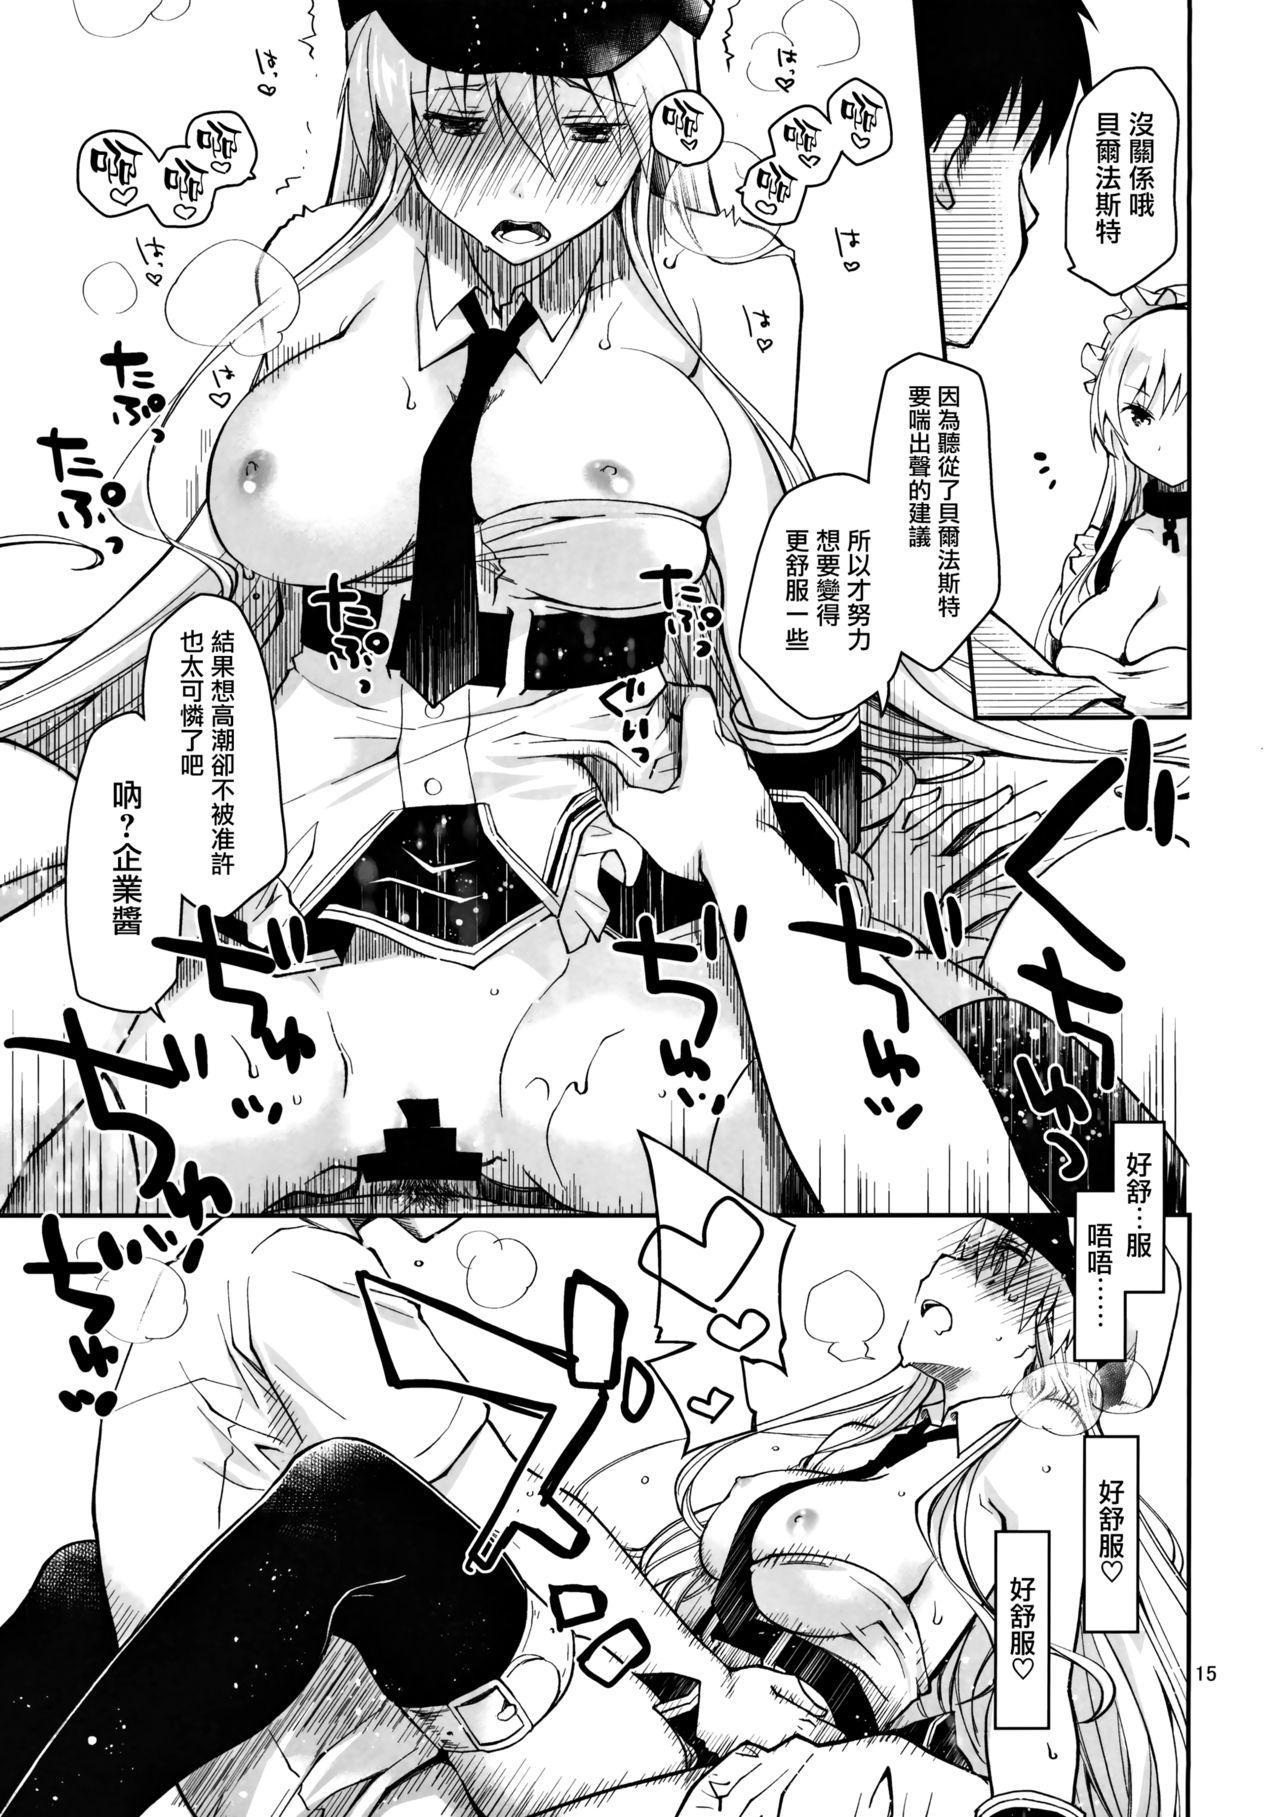 Maid in Enterprise 14